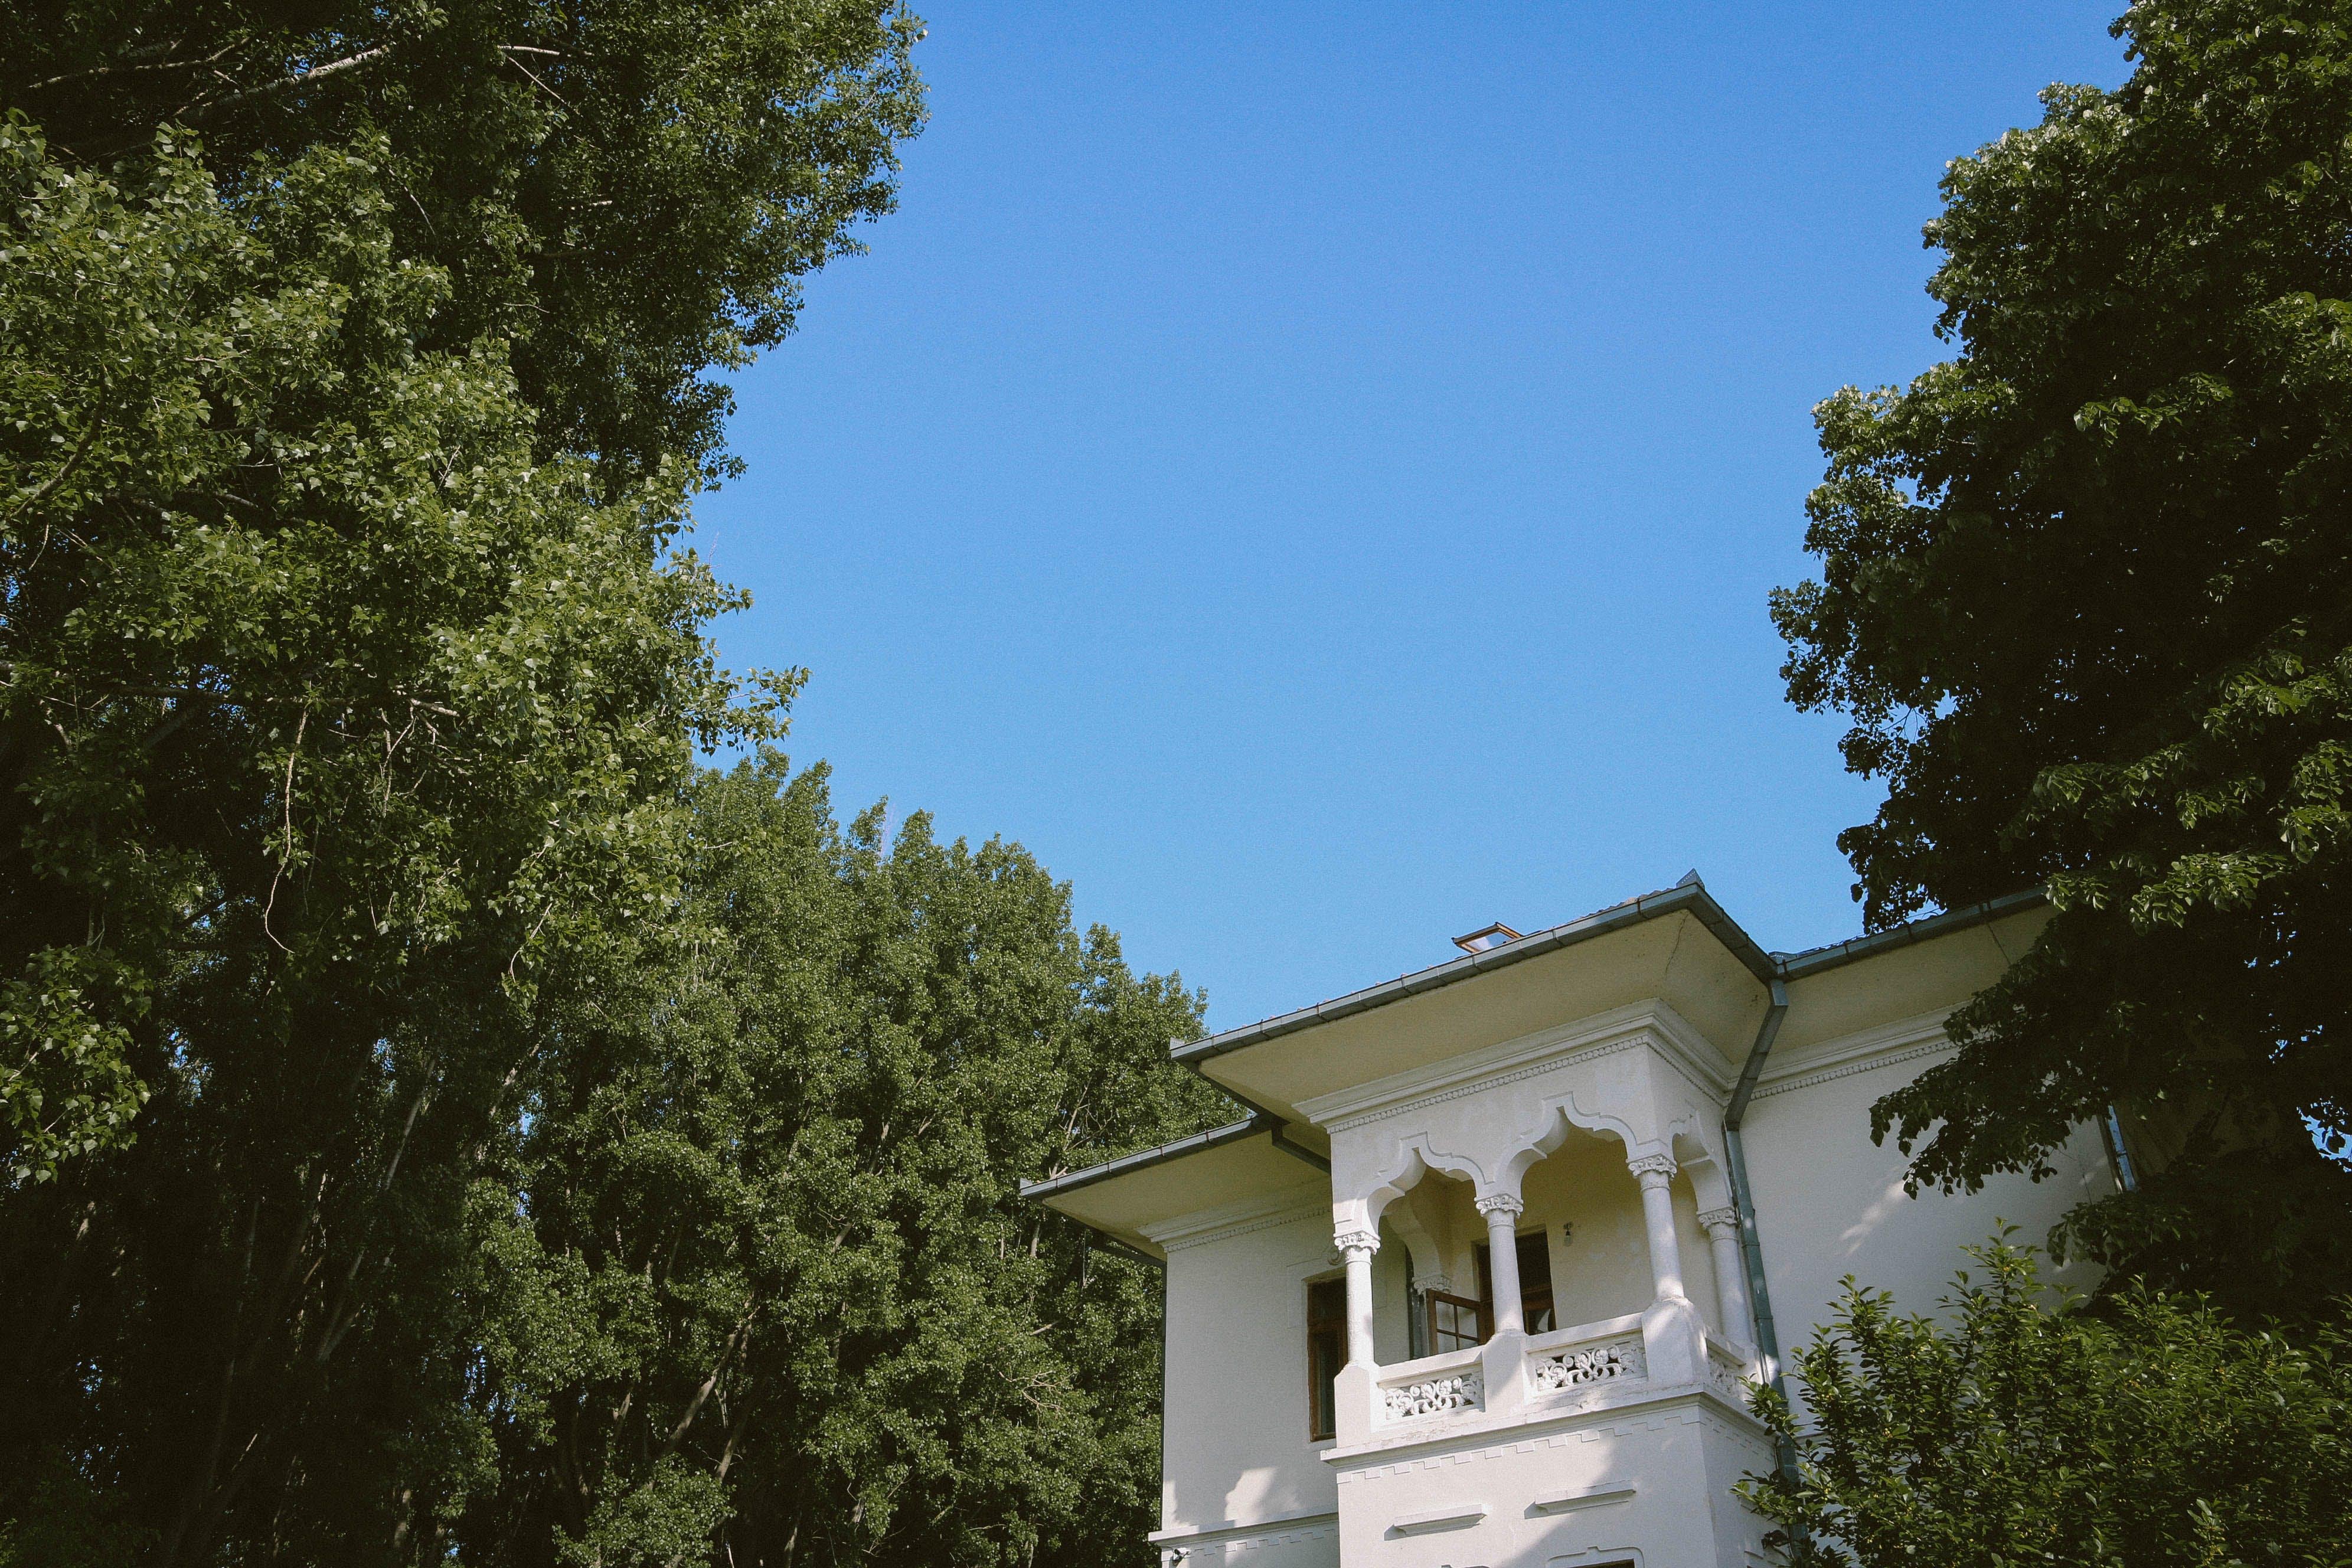 Free stock photo of architecture, balcony, blue sky, houses